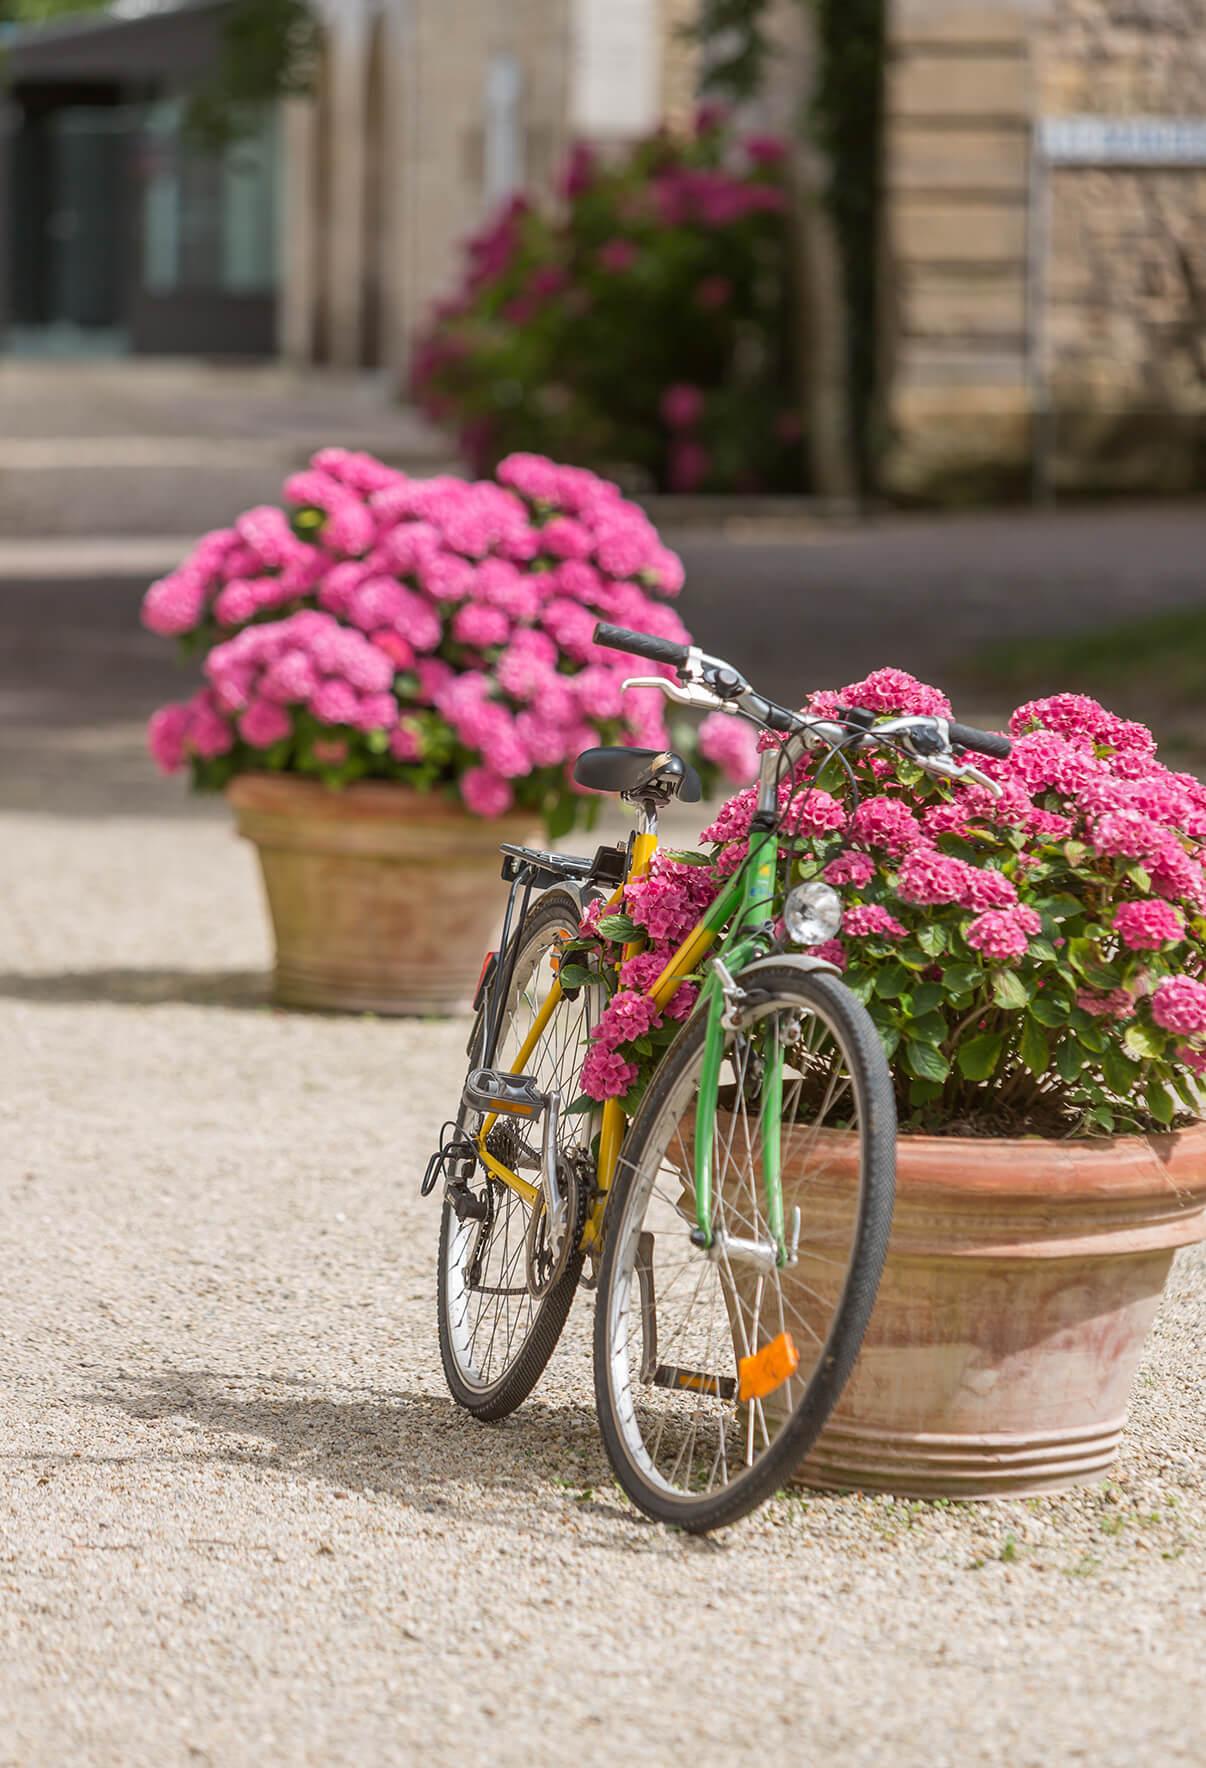 Accueil cyclotouristes en camping en Normandie